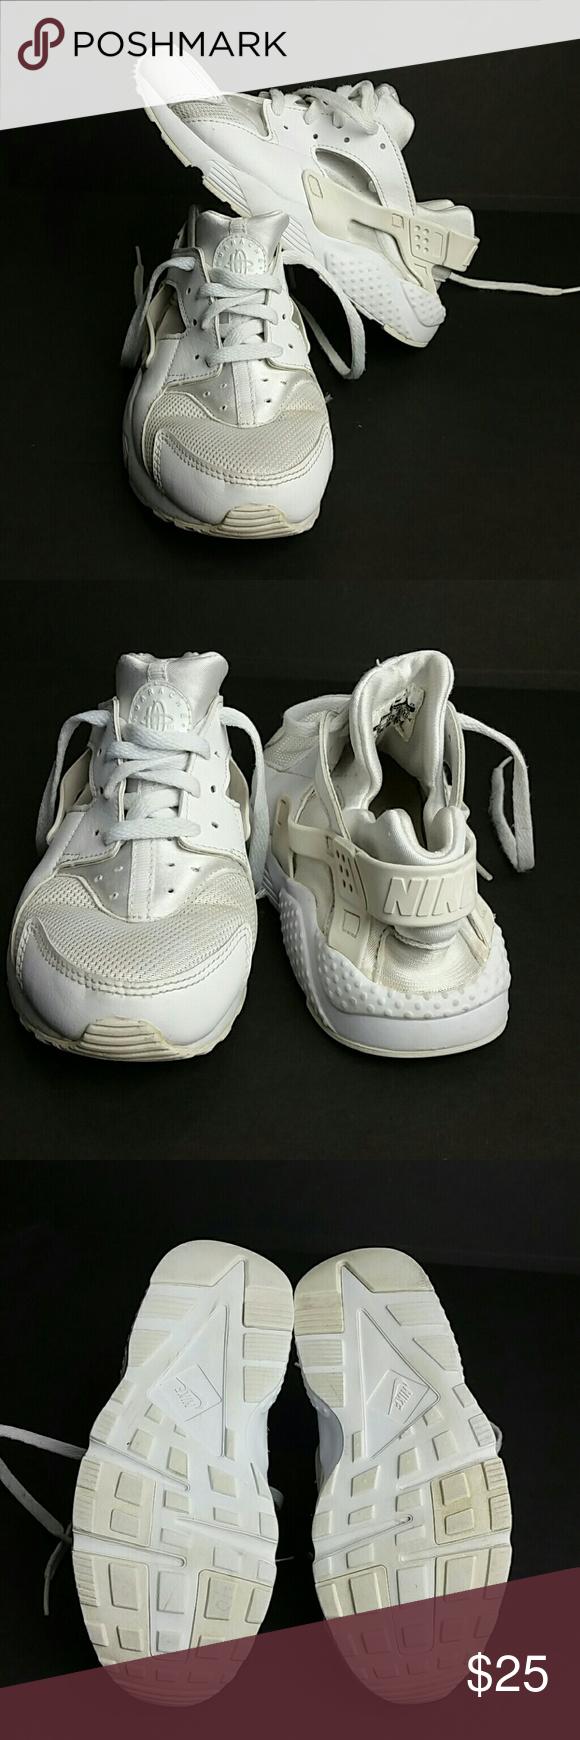 Nike air huarache youth shoes Youth shoes, Nike air huarache and